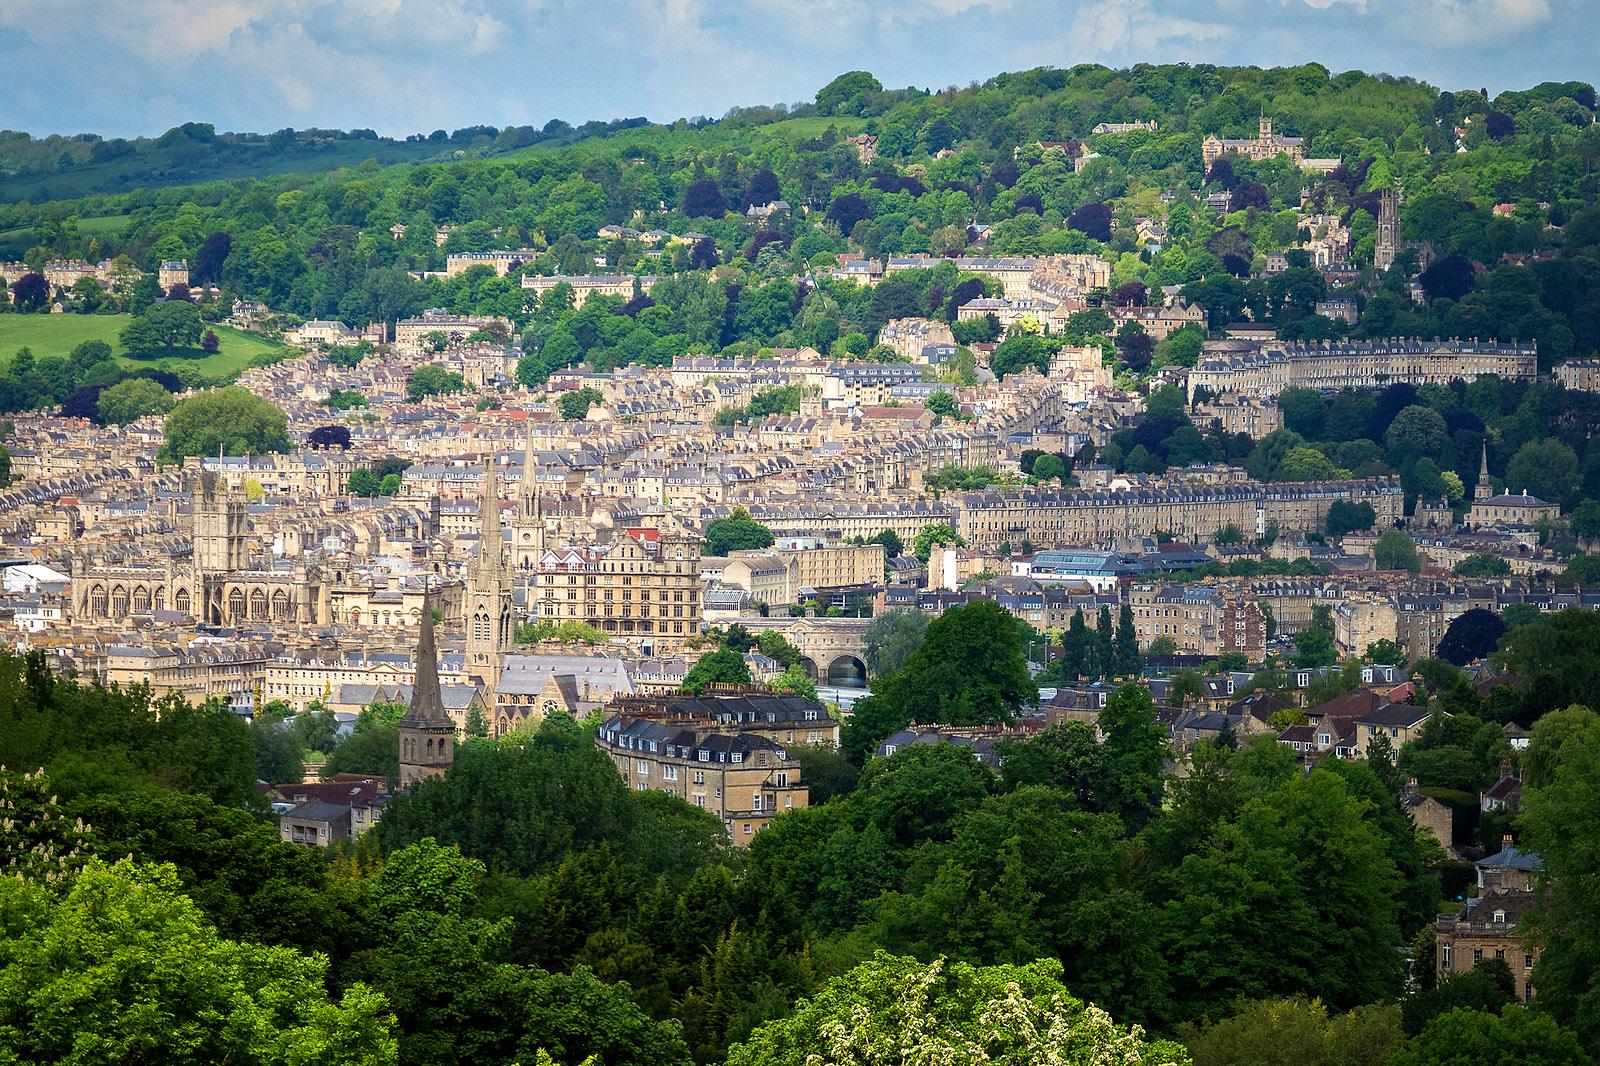 Bath, England skyline by Bob Radlinski.jpg